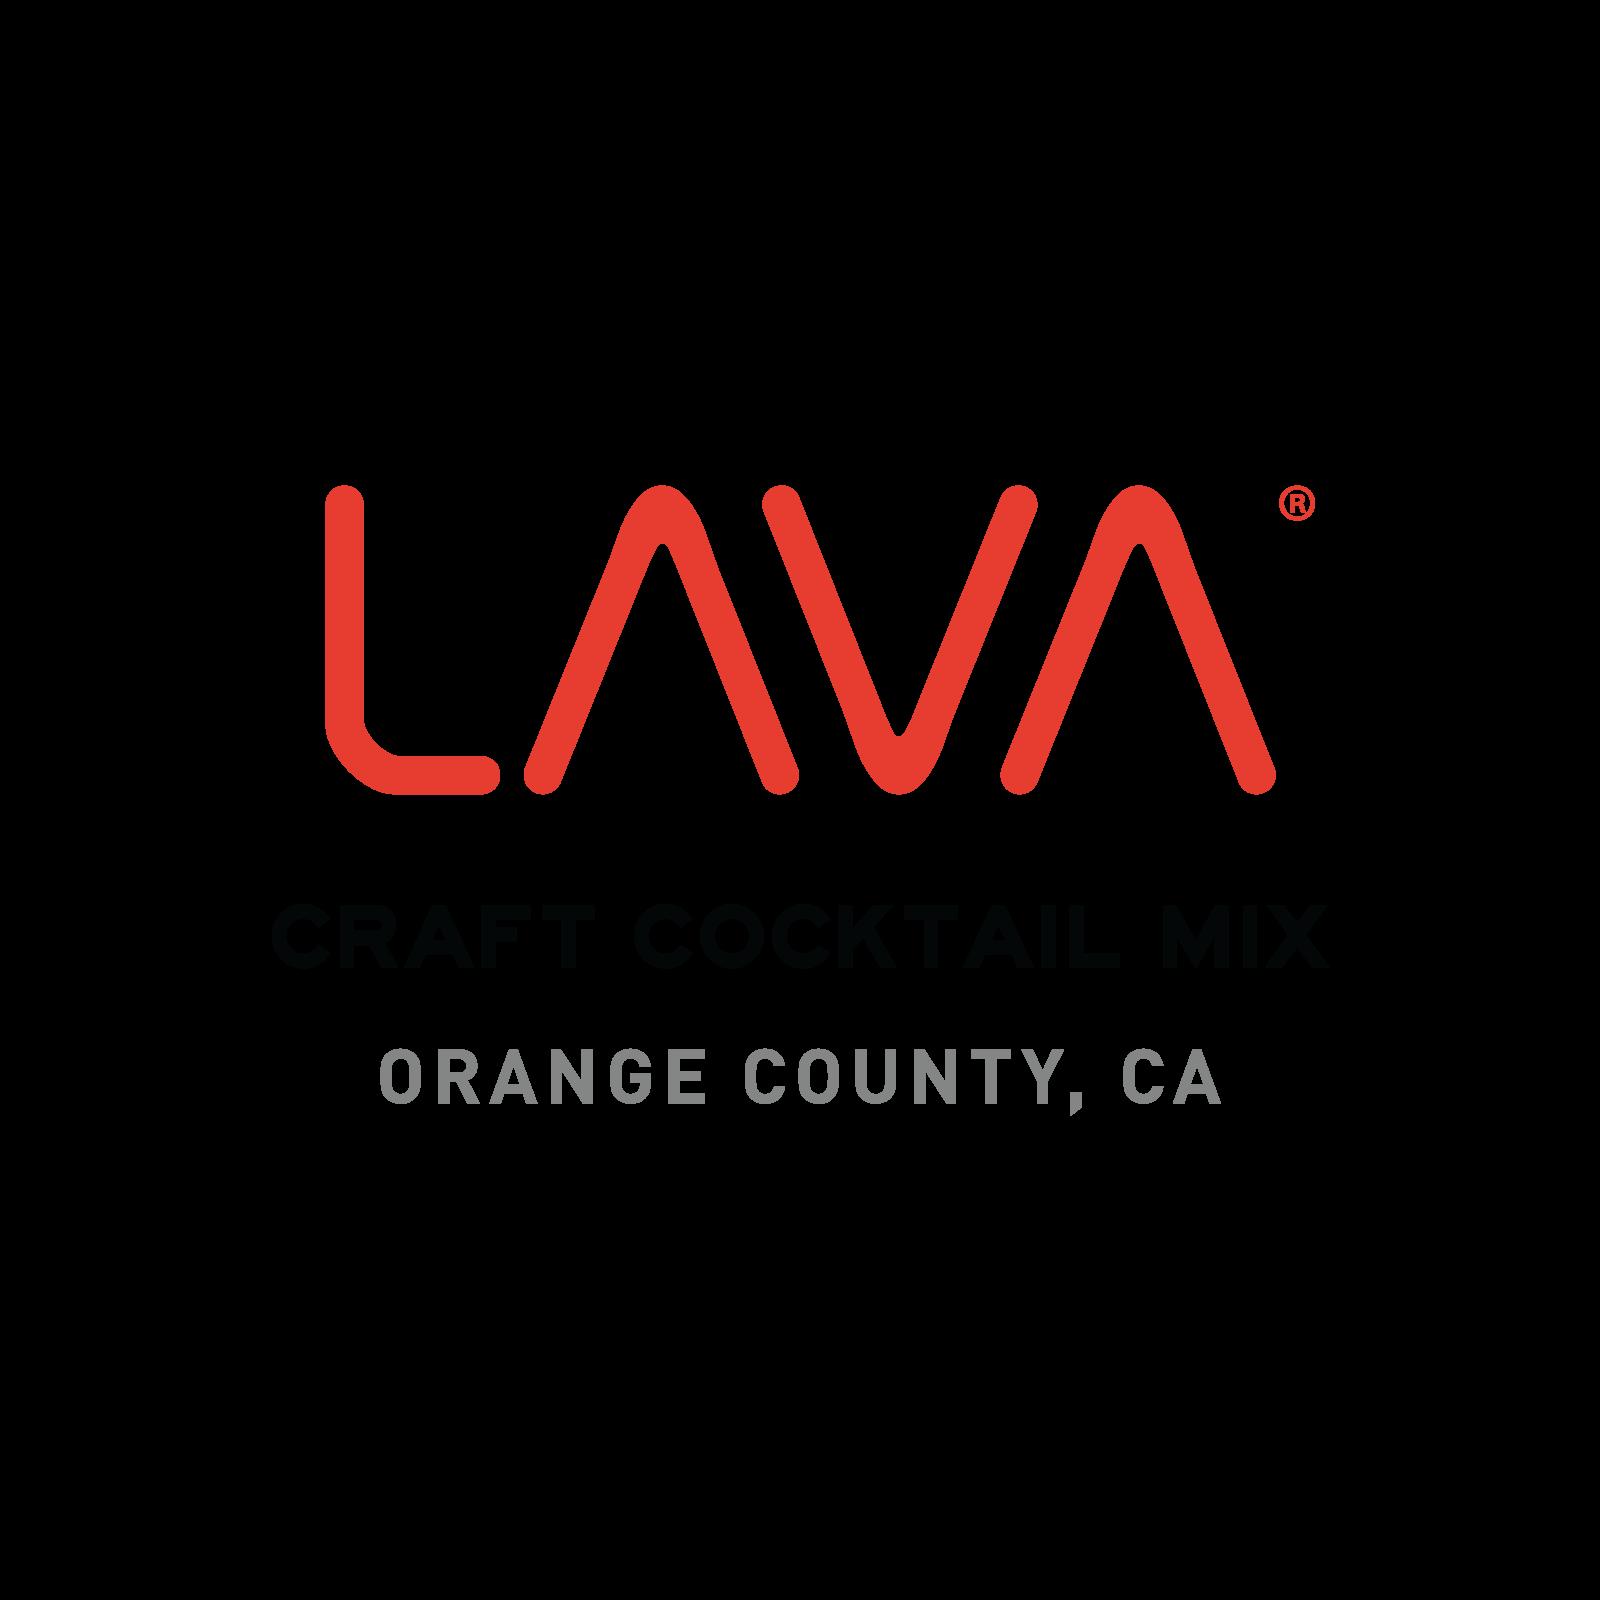 LAVA-LOGO-05.png